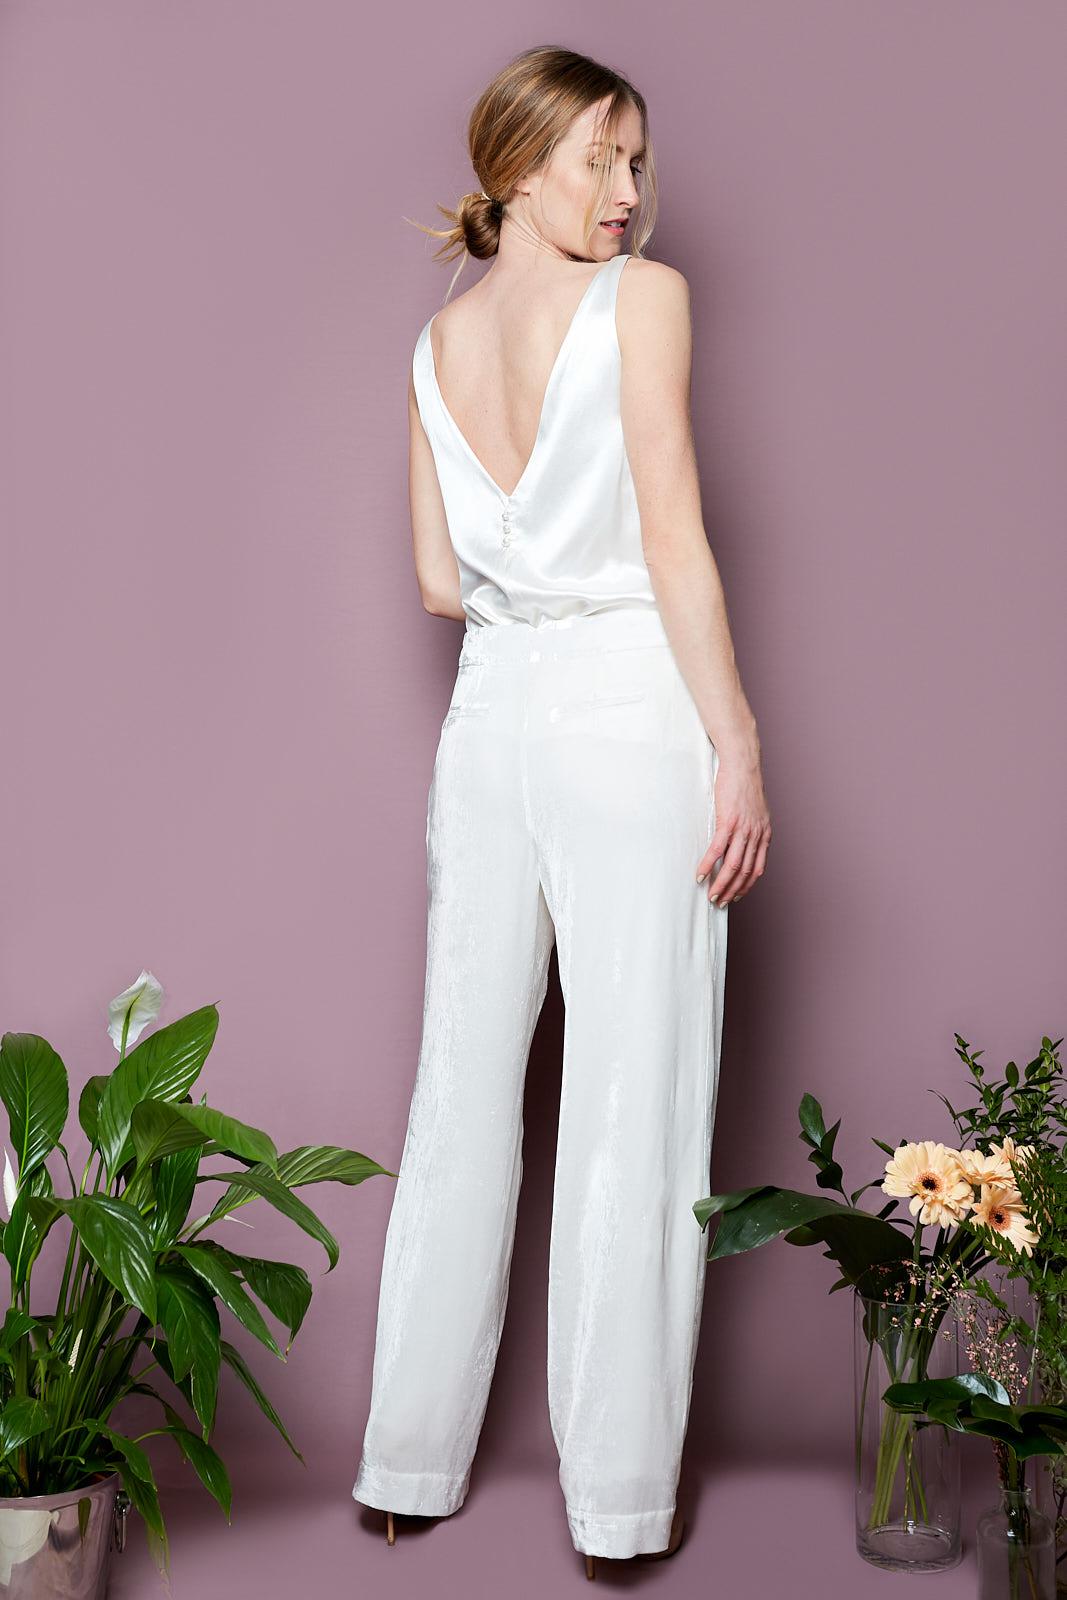 V Cami & Wide Leg Velvet Trousers  Cami Top in Heavy Silk Satin, lined in Sandwashed silk satin  Wide Leg Silk Cotton Velvet Trousers, lined in Sandwashed Silk Satin